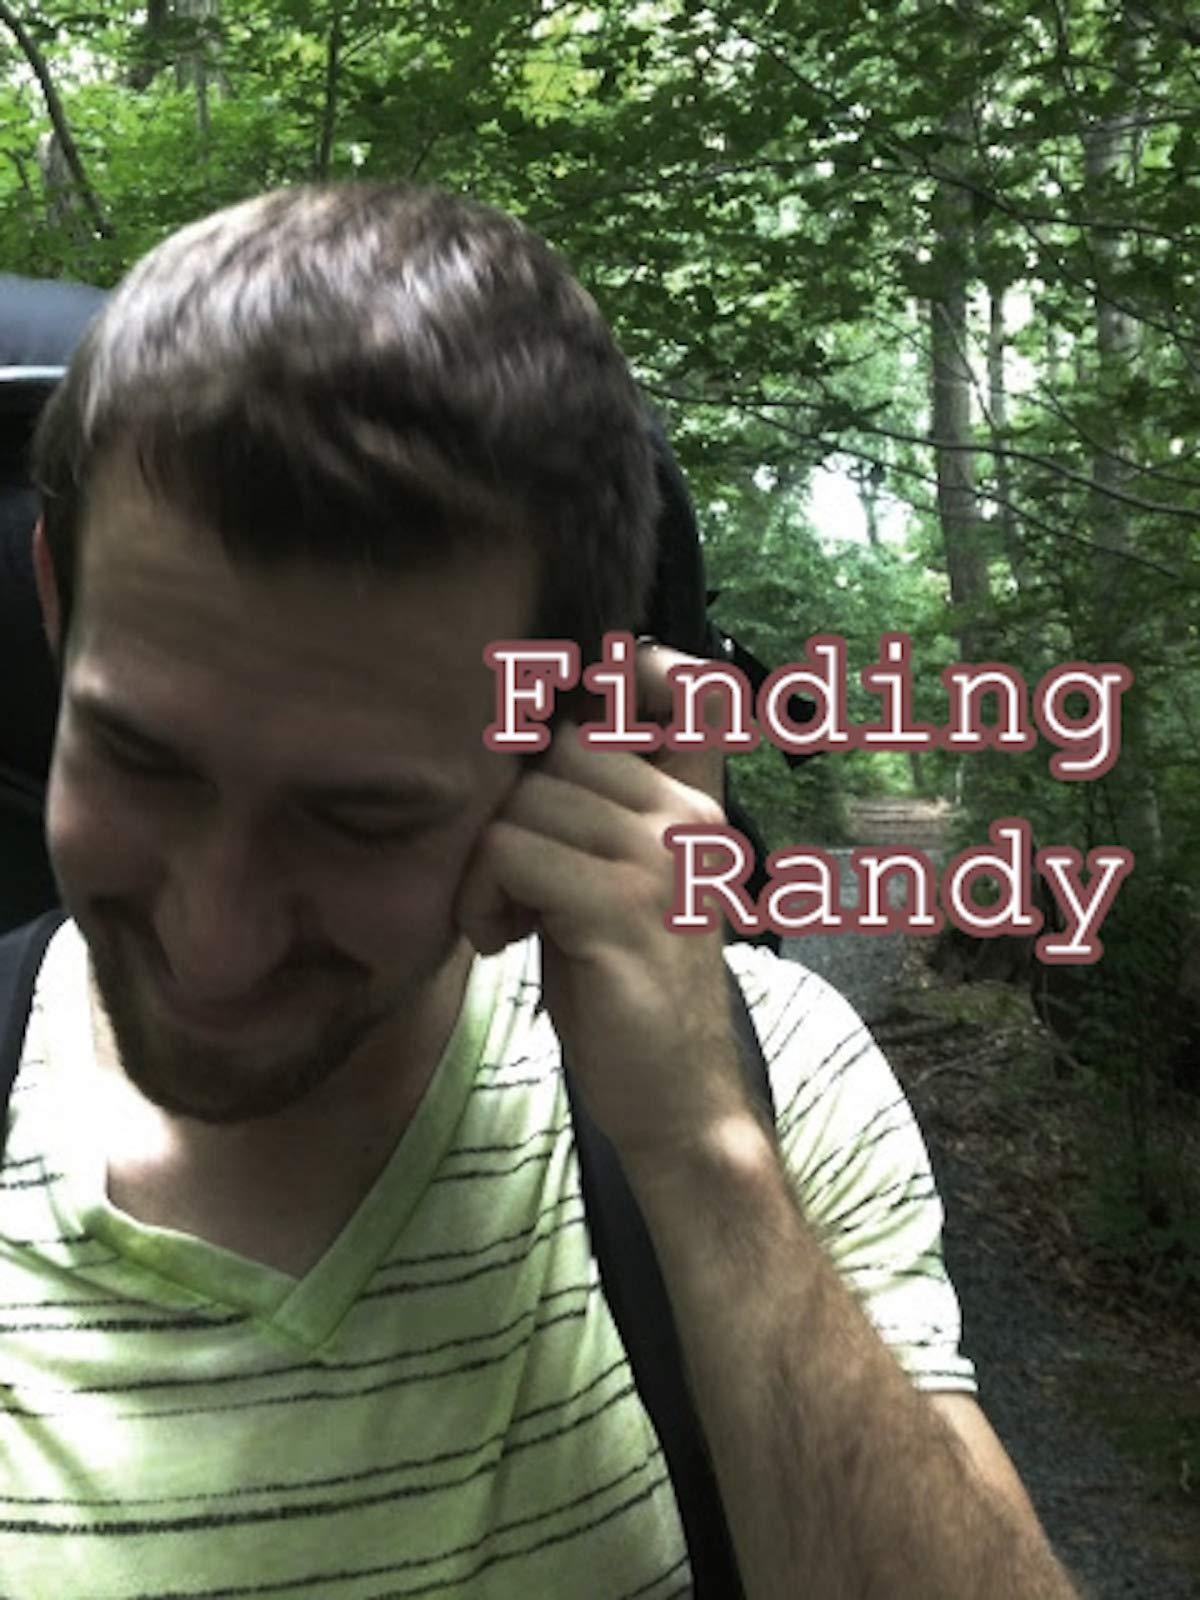 Finding Randy